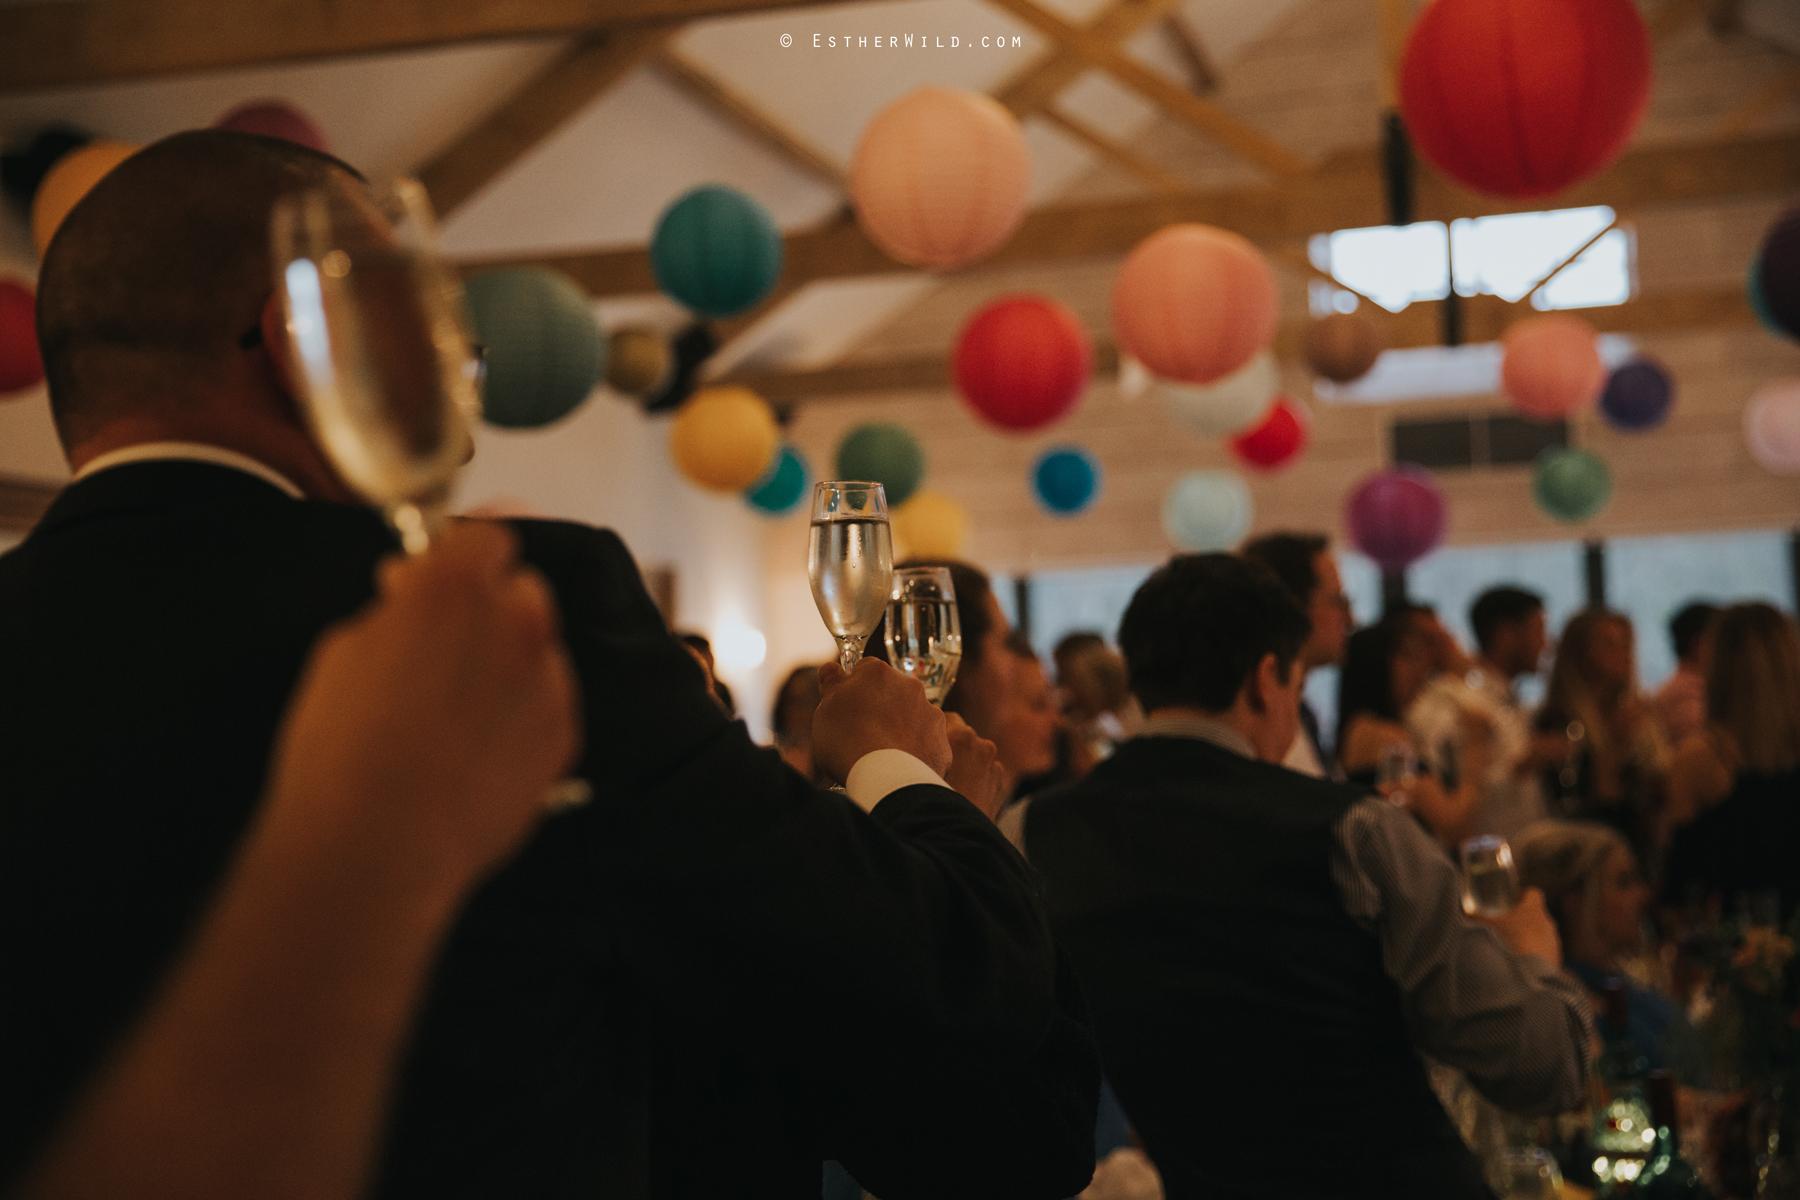 The_BoatHouse_Wedding_Venue_Ormesby_Norfolk_Broads_Boat_Wedding_Photography_Esther_Wild_Photographer_IMG_3102.jpg